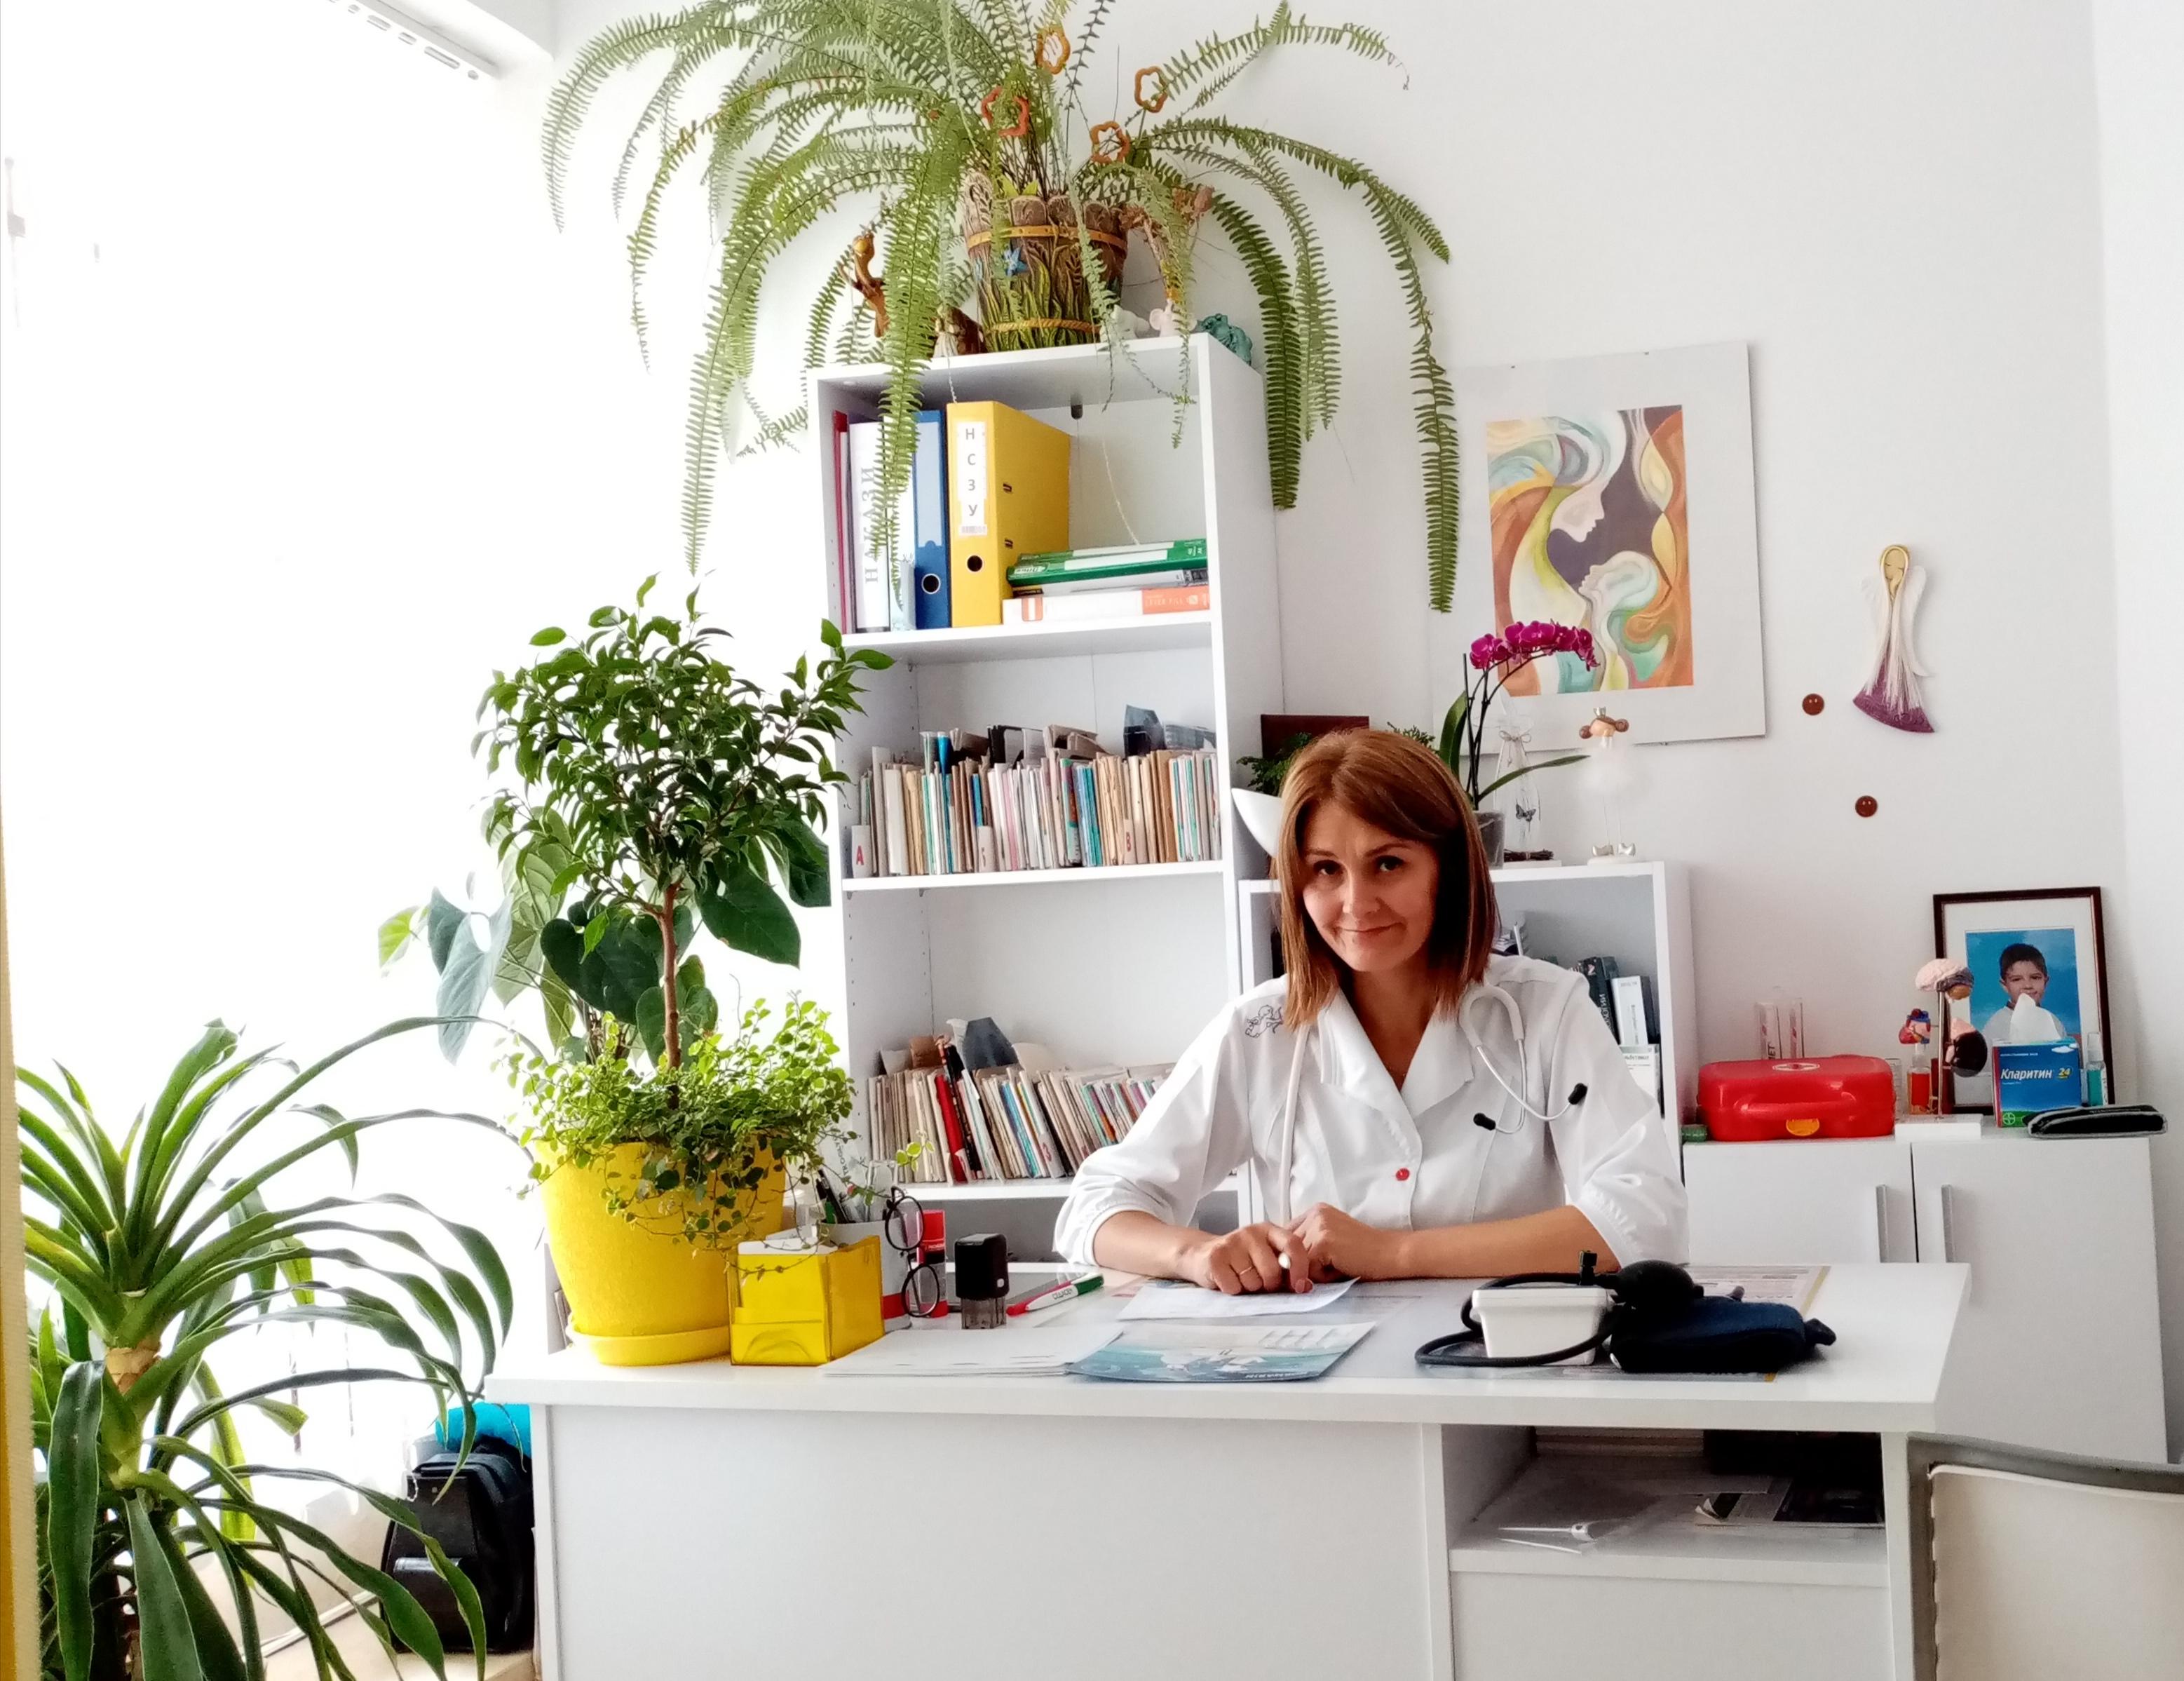 Наталья Феденко, Фото: личный архив Натальи Феденко